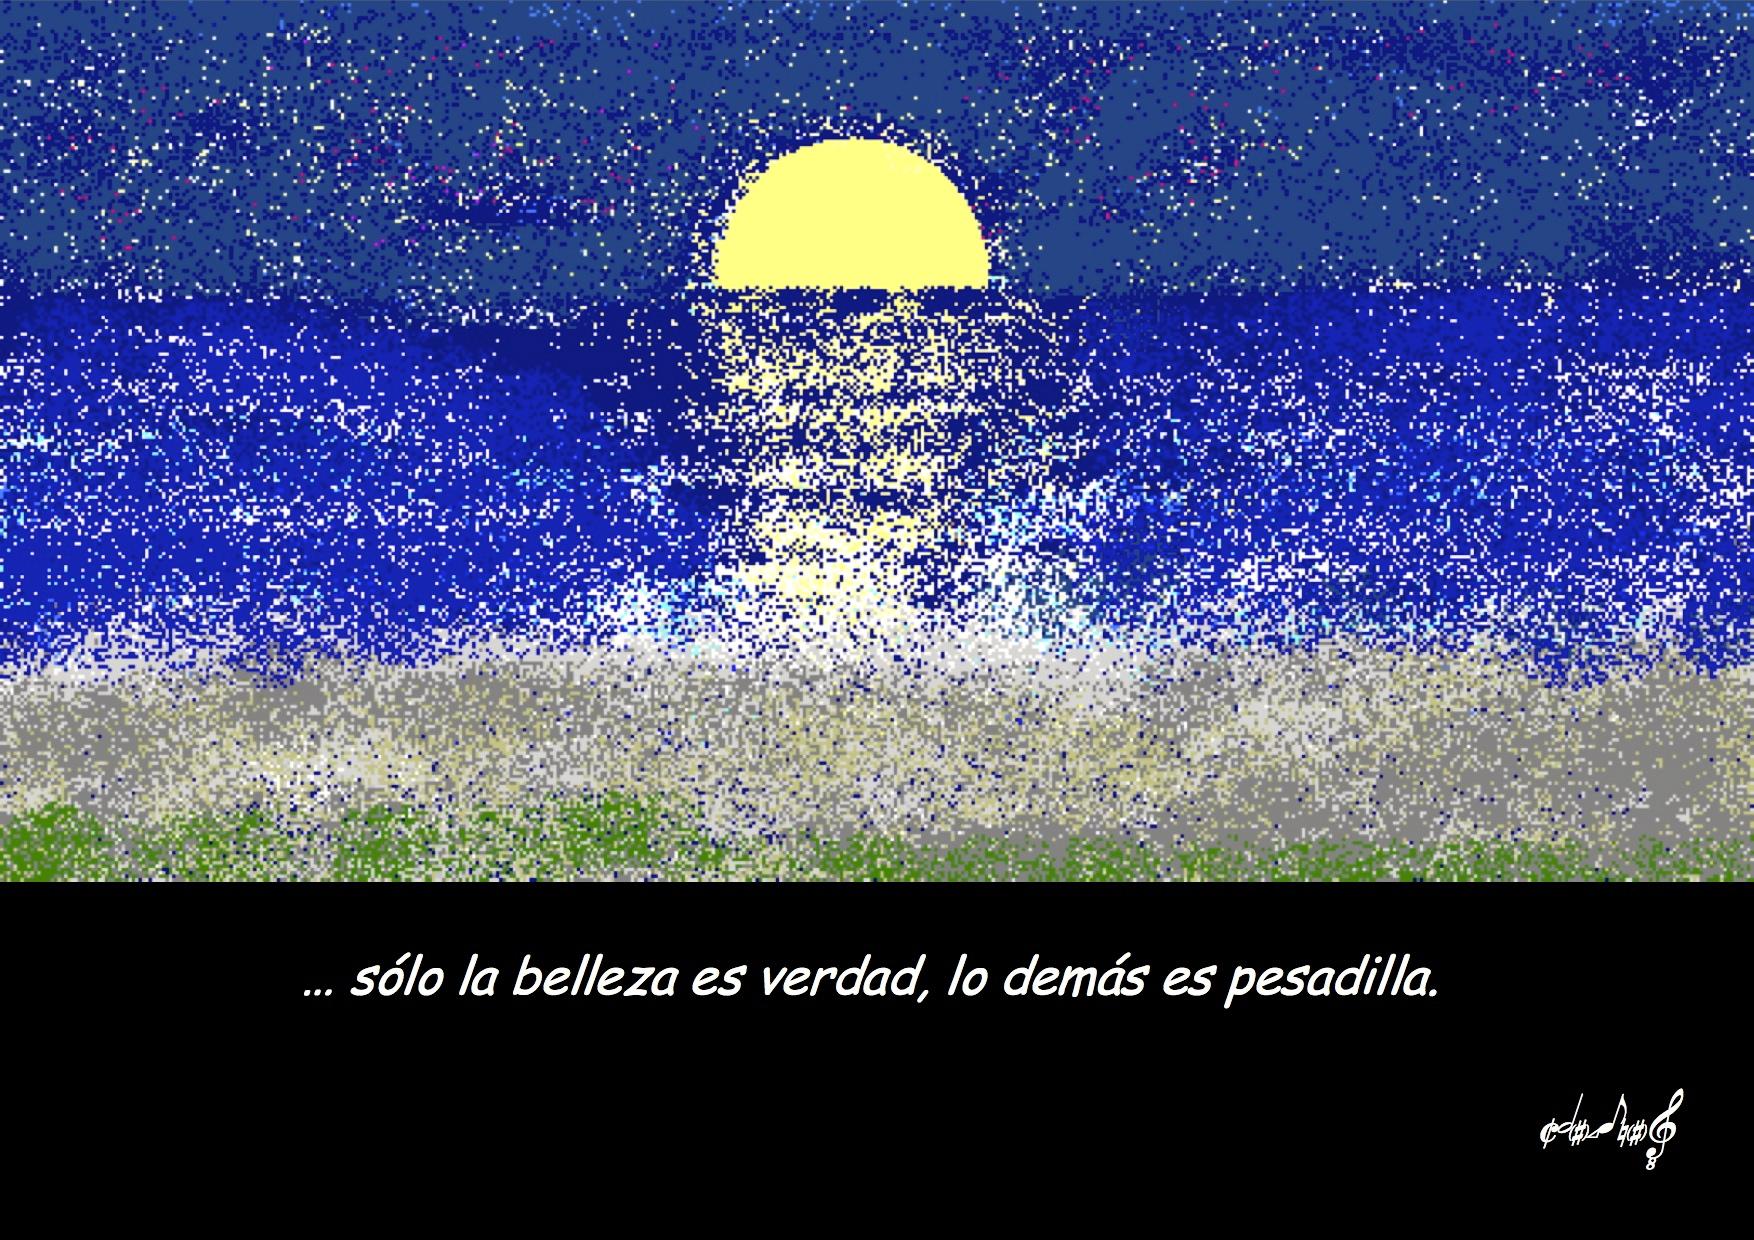 POEMAS_PINTURAS_sololabelleza de_Chalena